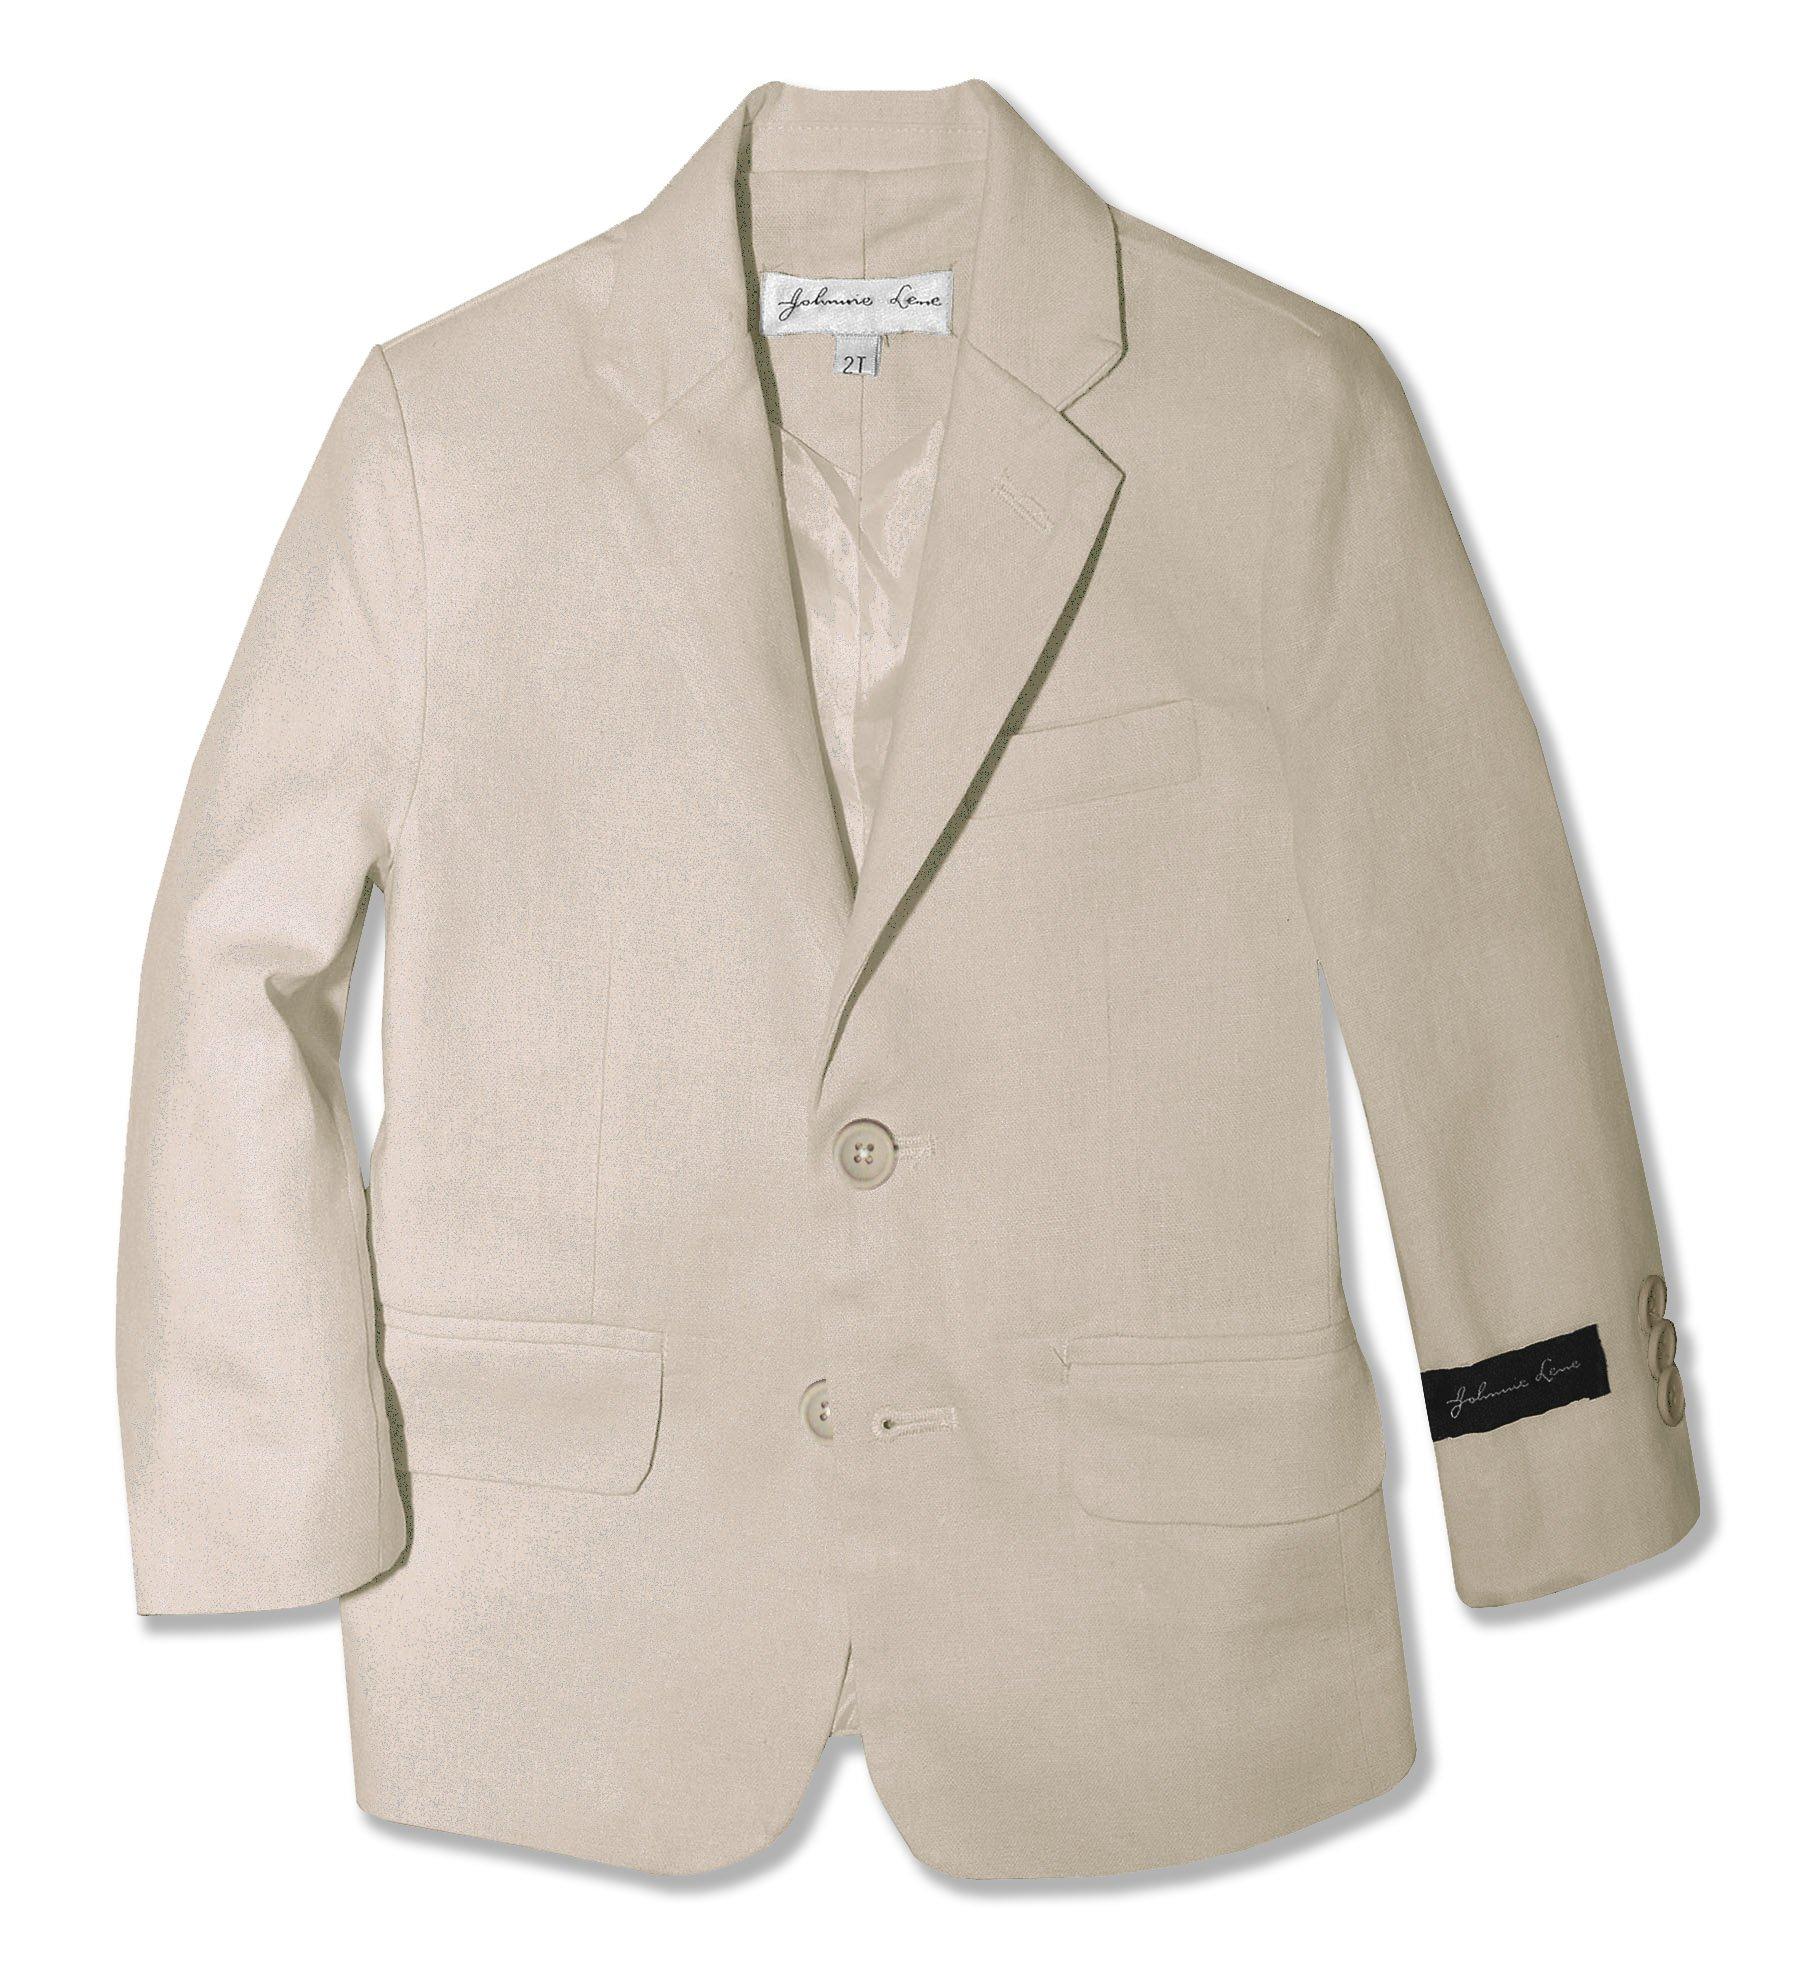 Johnnie Lene Toddlers Kids Boys' Cotton/Linen Blazer Jacket #JJL38 (2T, Natural) by Johnnie Lene (Image #1)